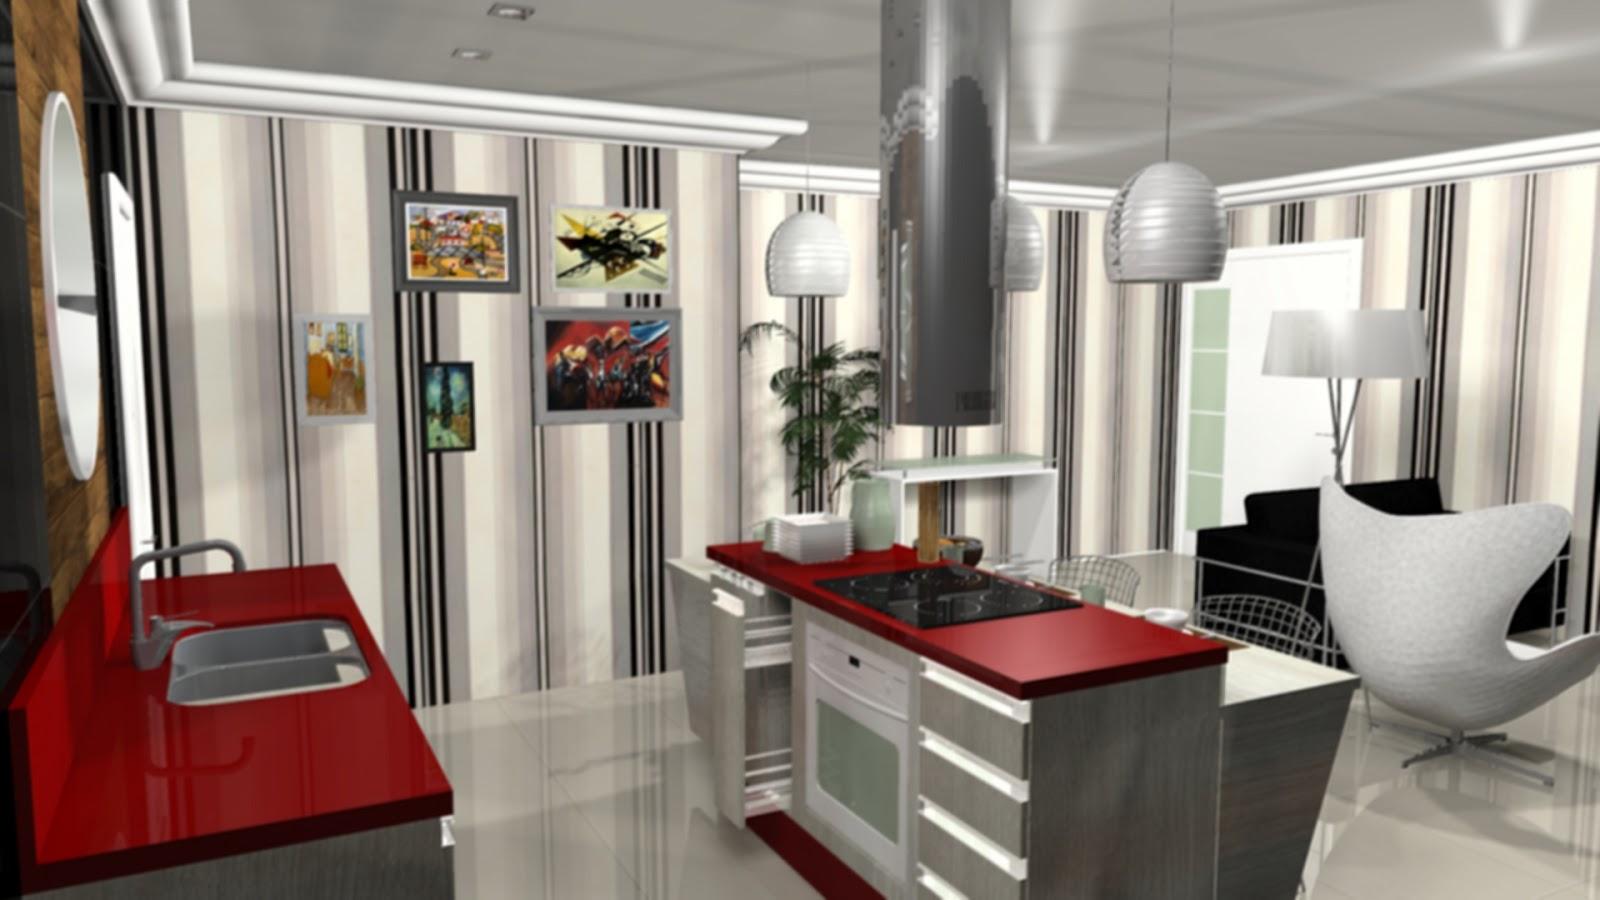 COZINHA ILHA BENEDITO ESTEVAM II Art Design Marcenaria #711D18 1600 900